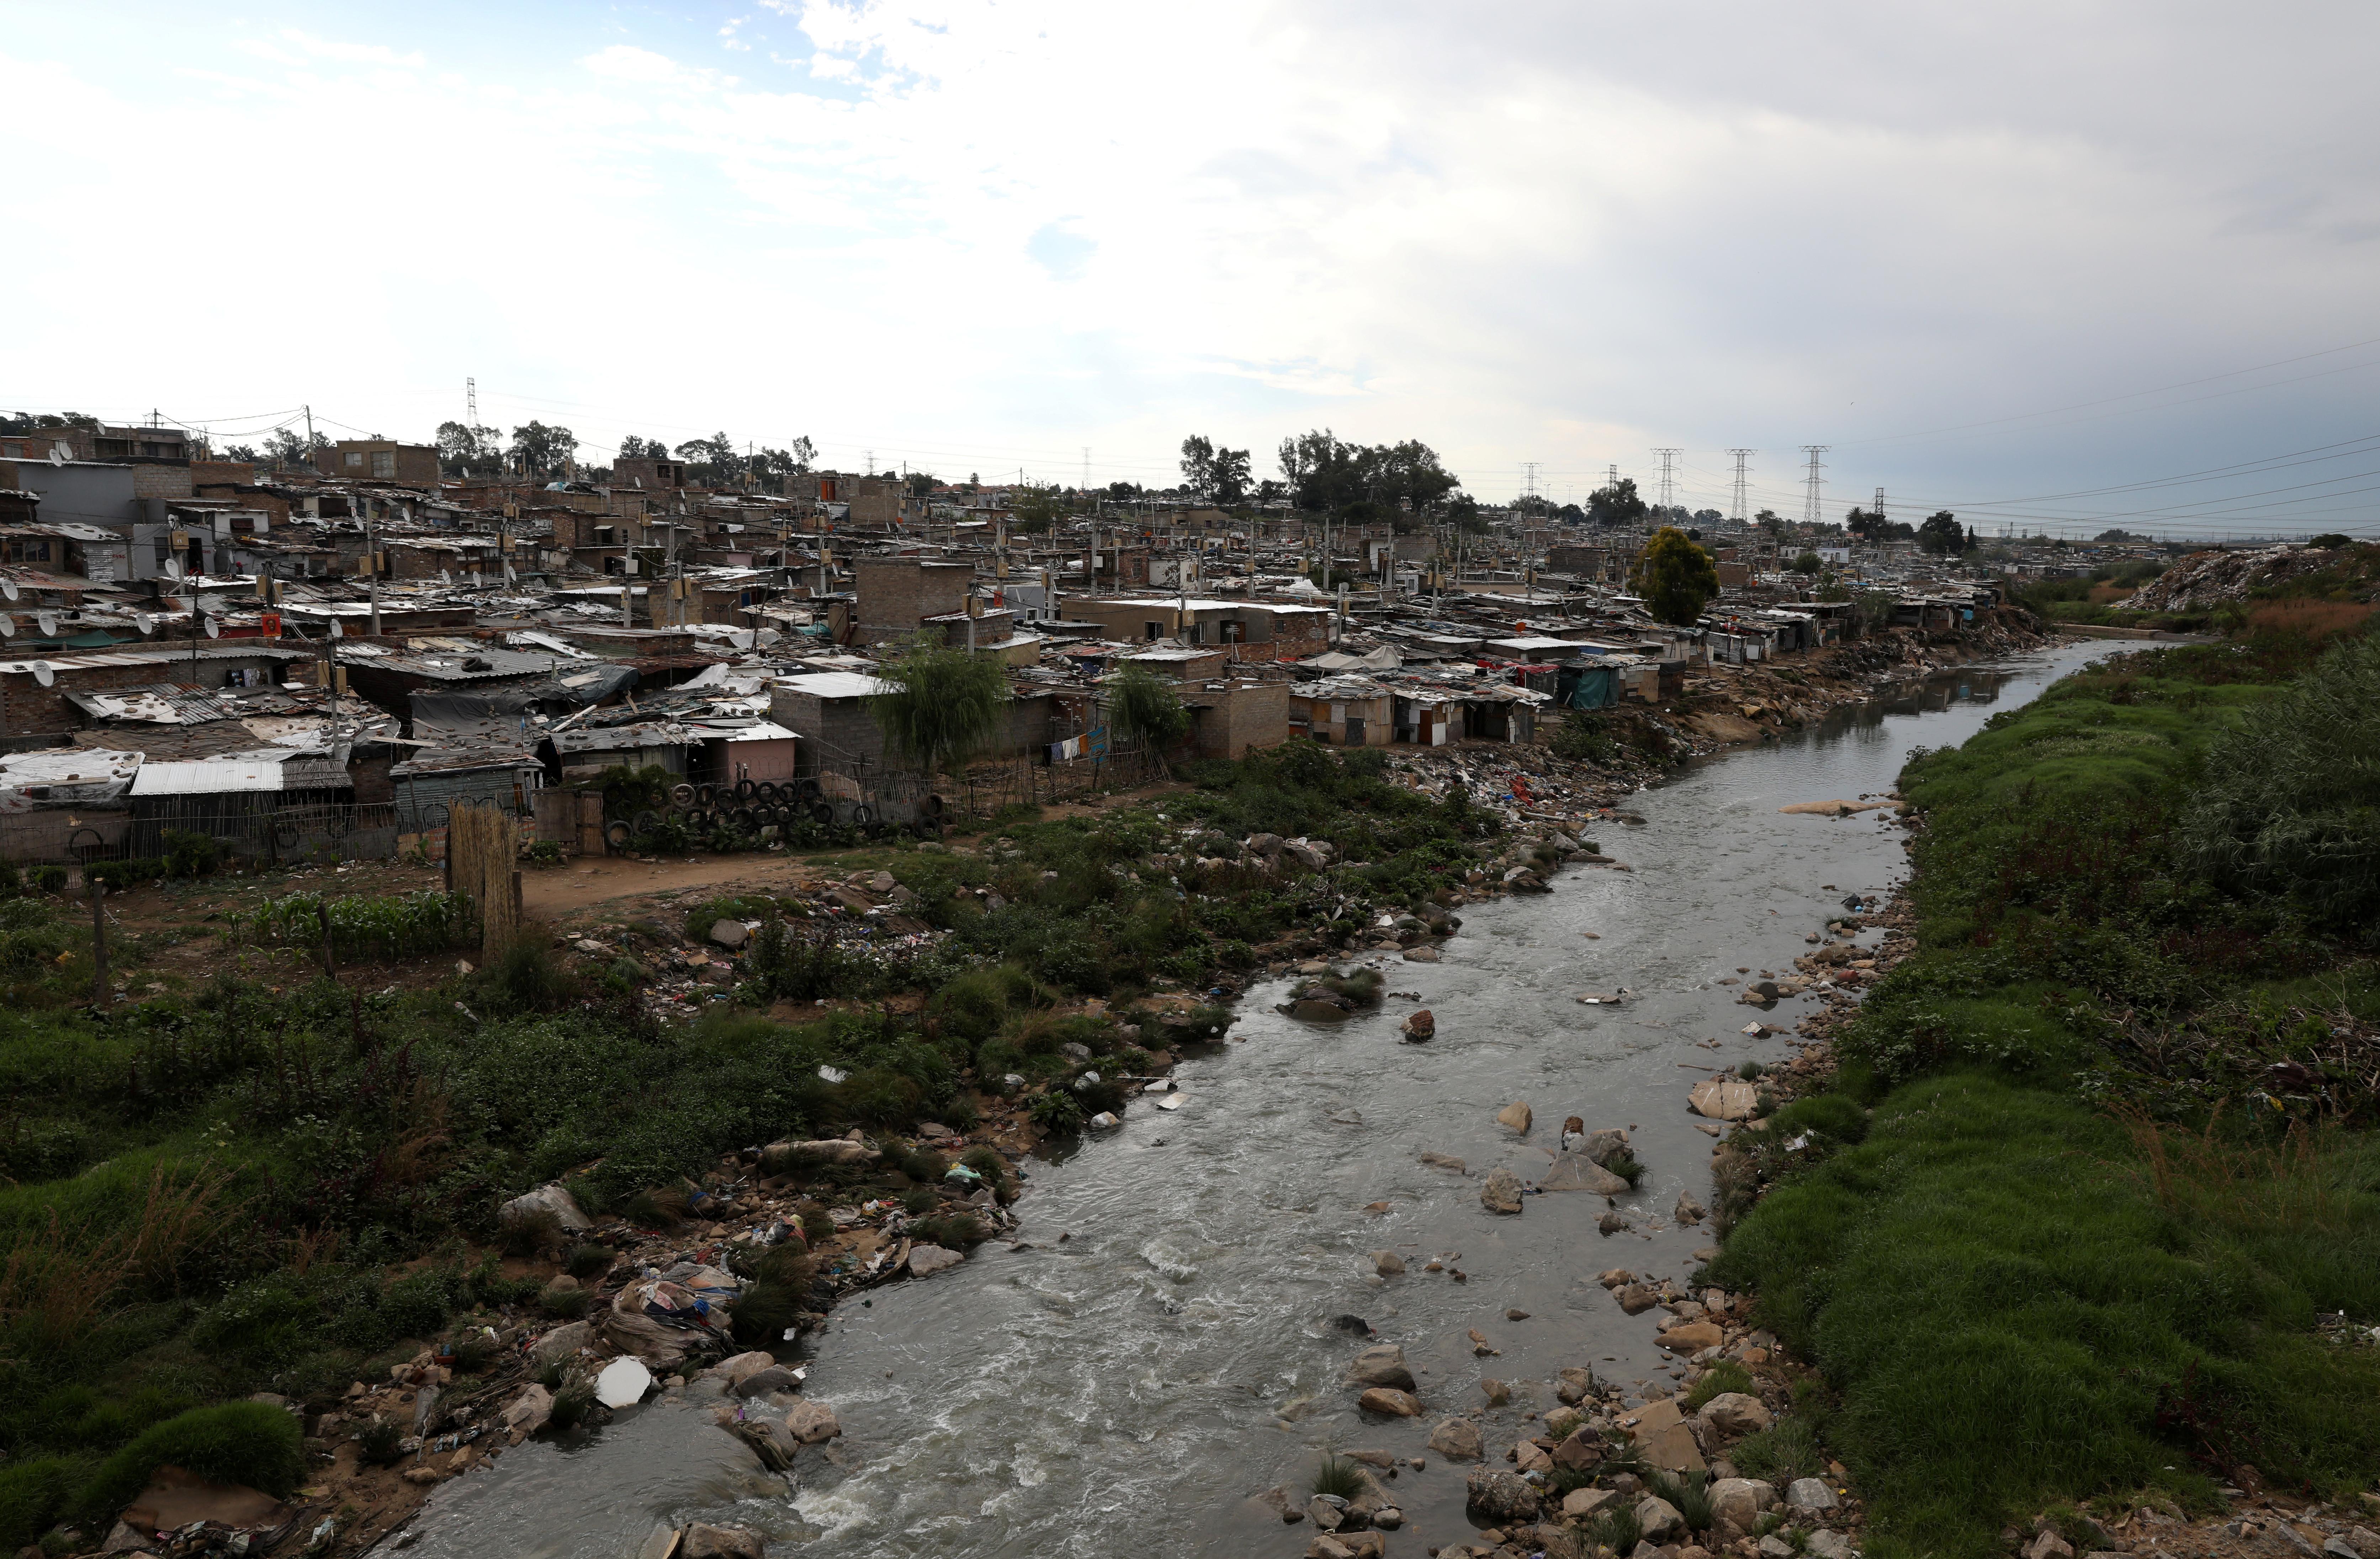 Shacks are seen along Jukskei river in Alexandra township, Johannesburg, South Africa